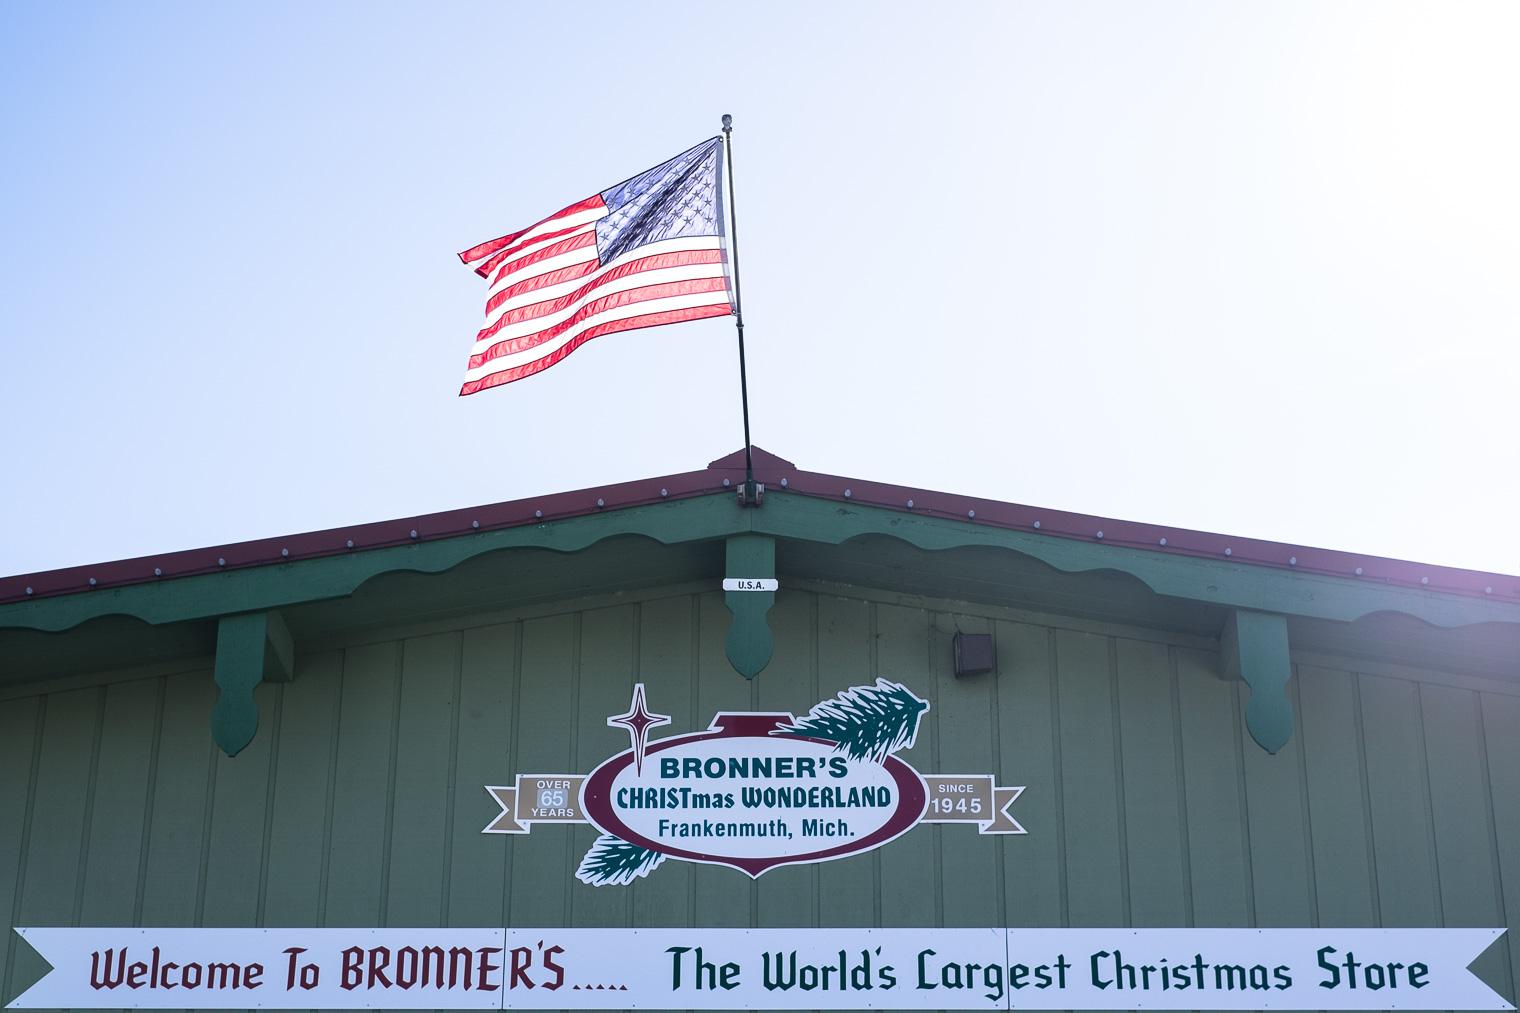 worlds largest christmas store dscf4978 - Worlds Largest Christmas Store